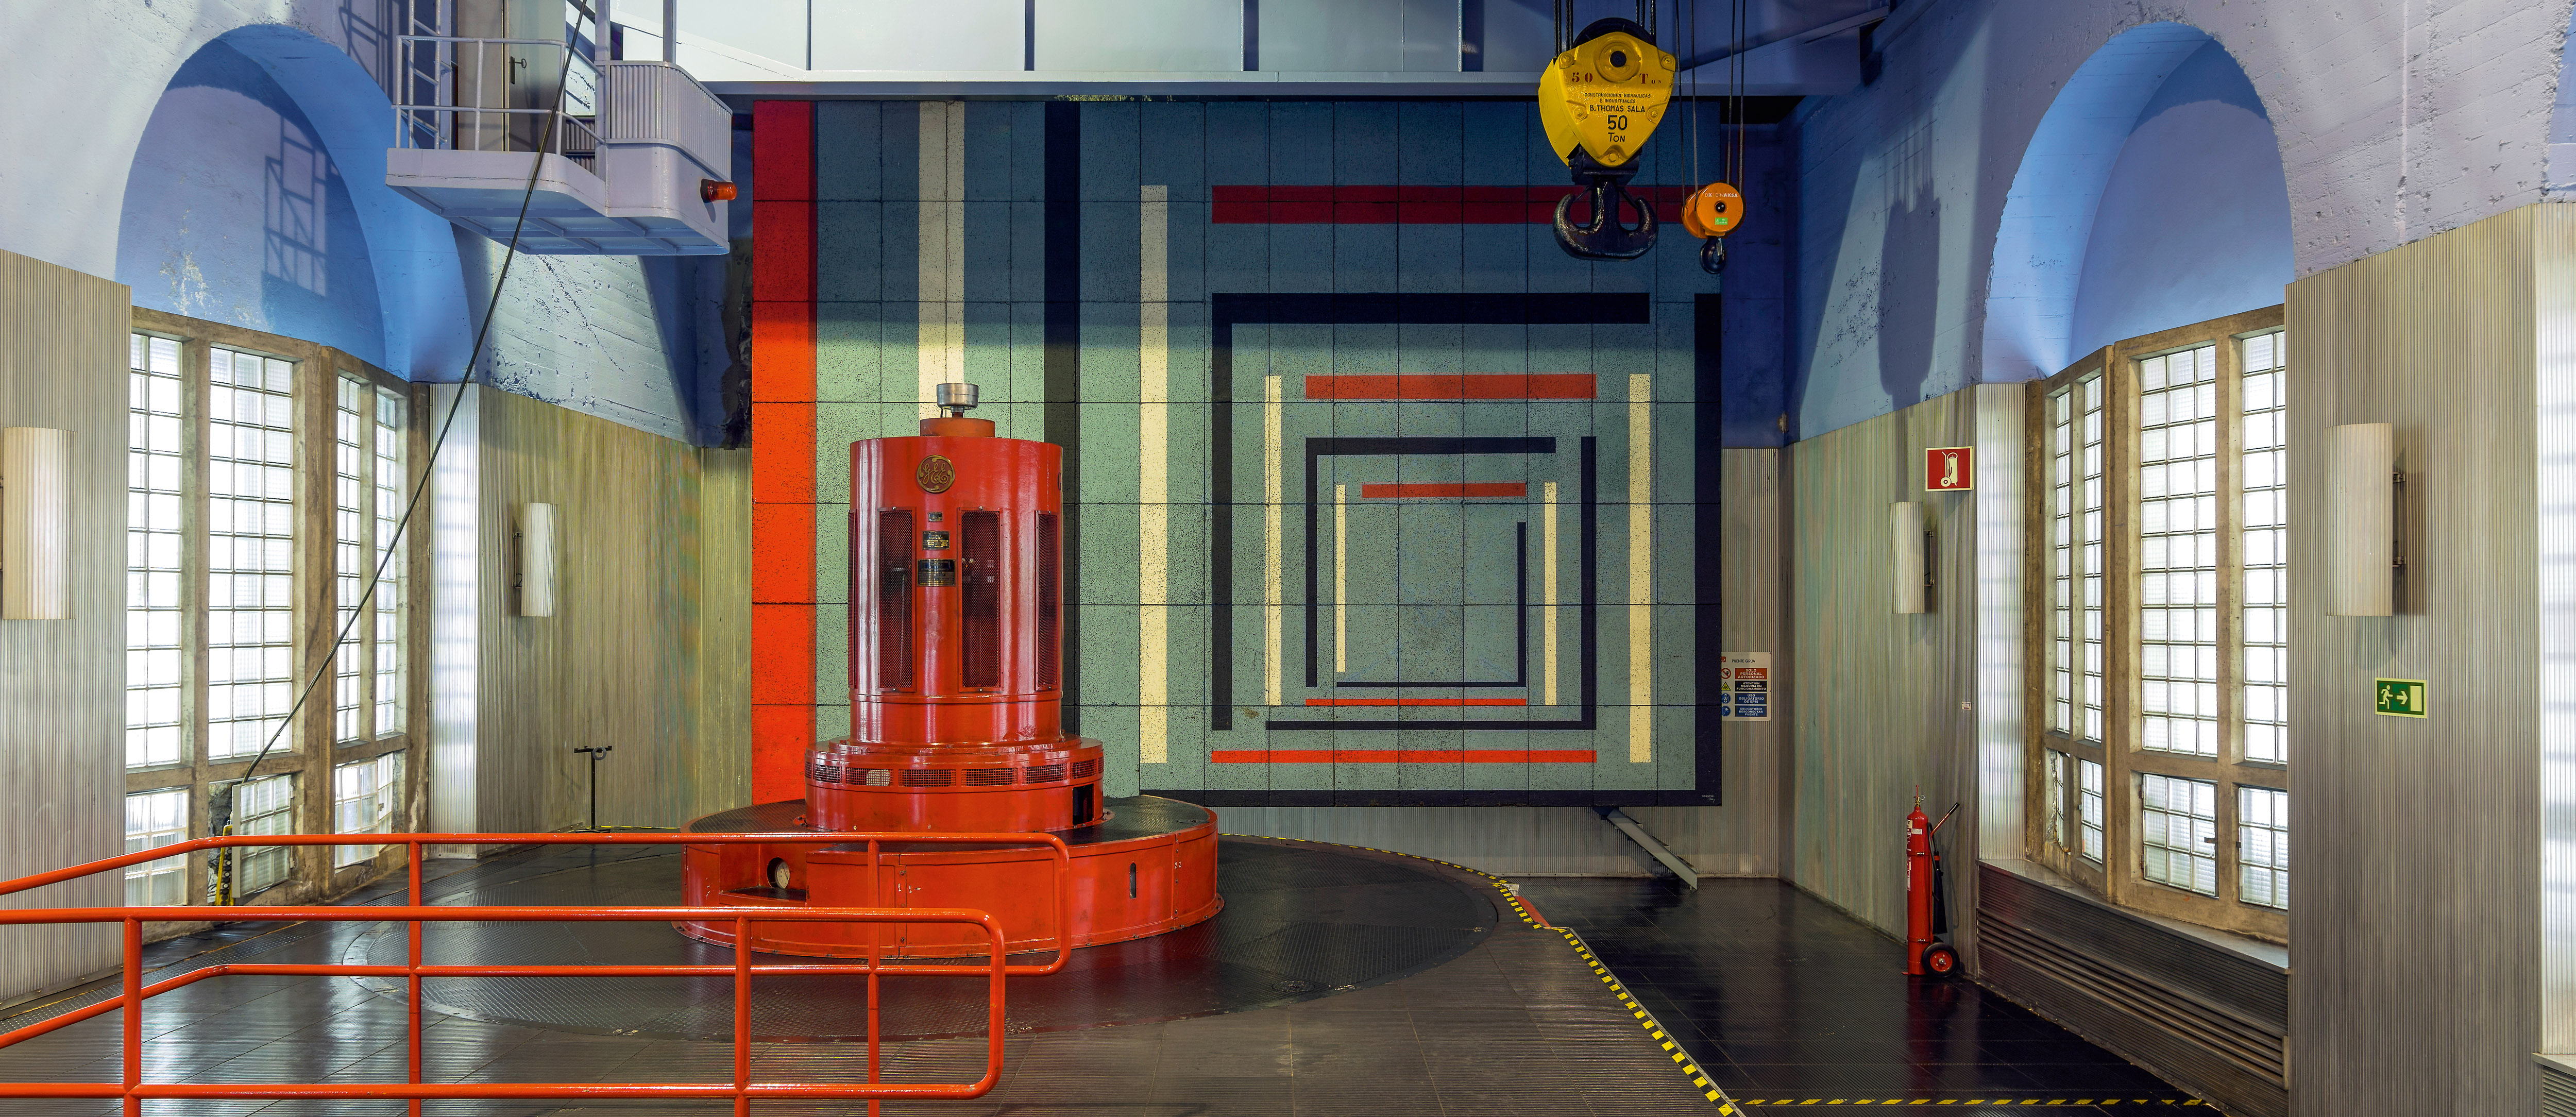 Hydroelectric Power Station of Miranda